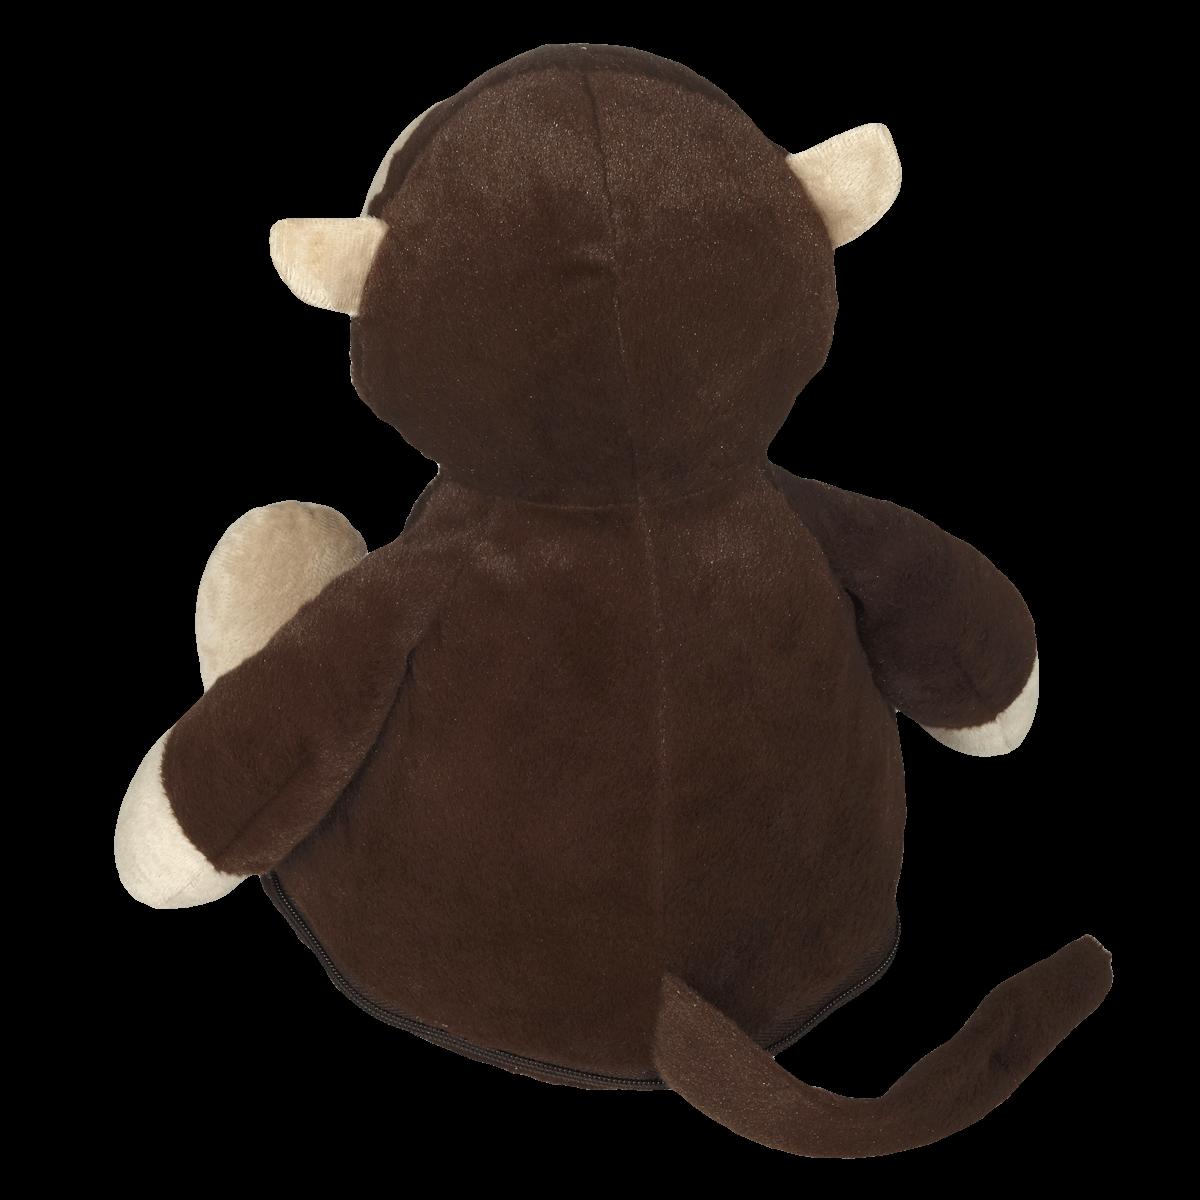 embroider buddy® – Monty Monkey Buddy